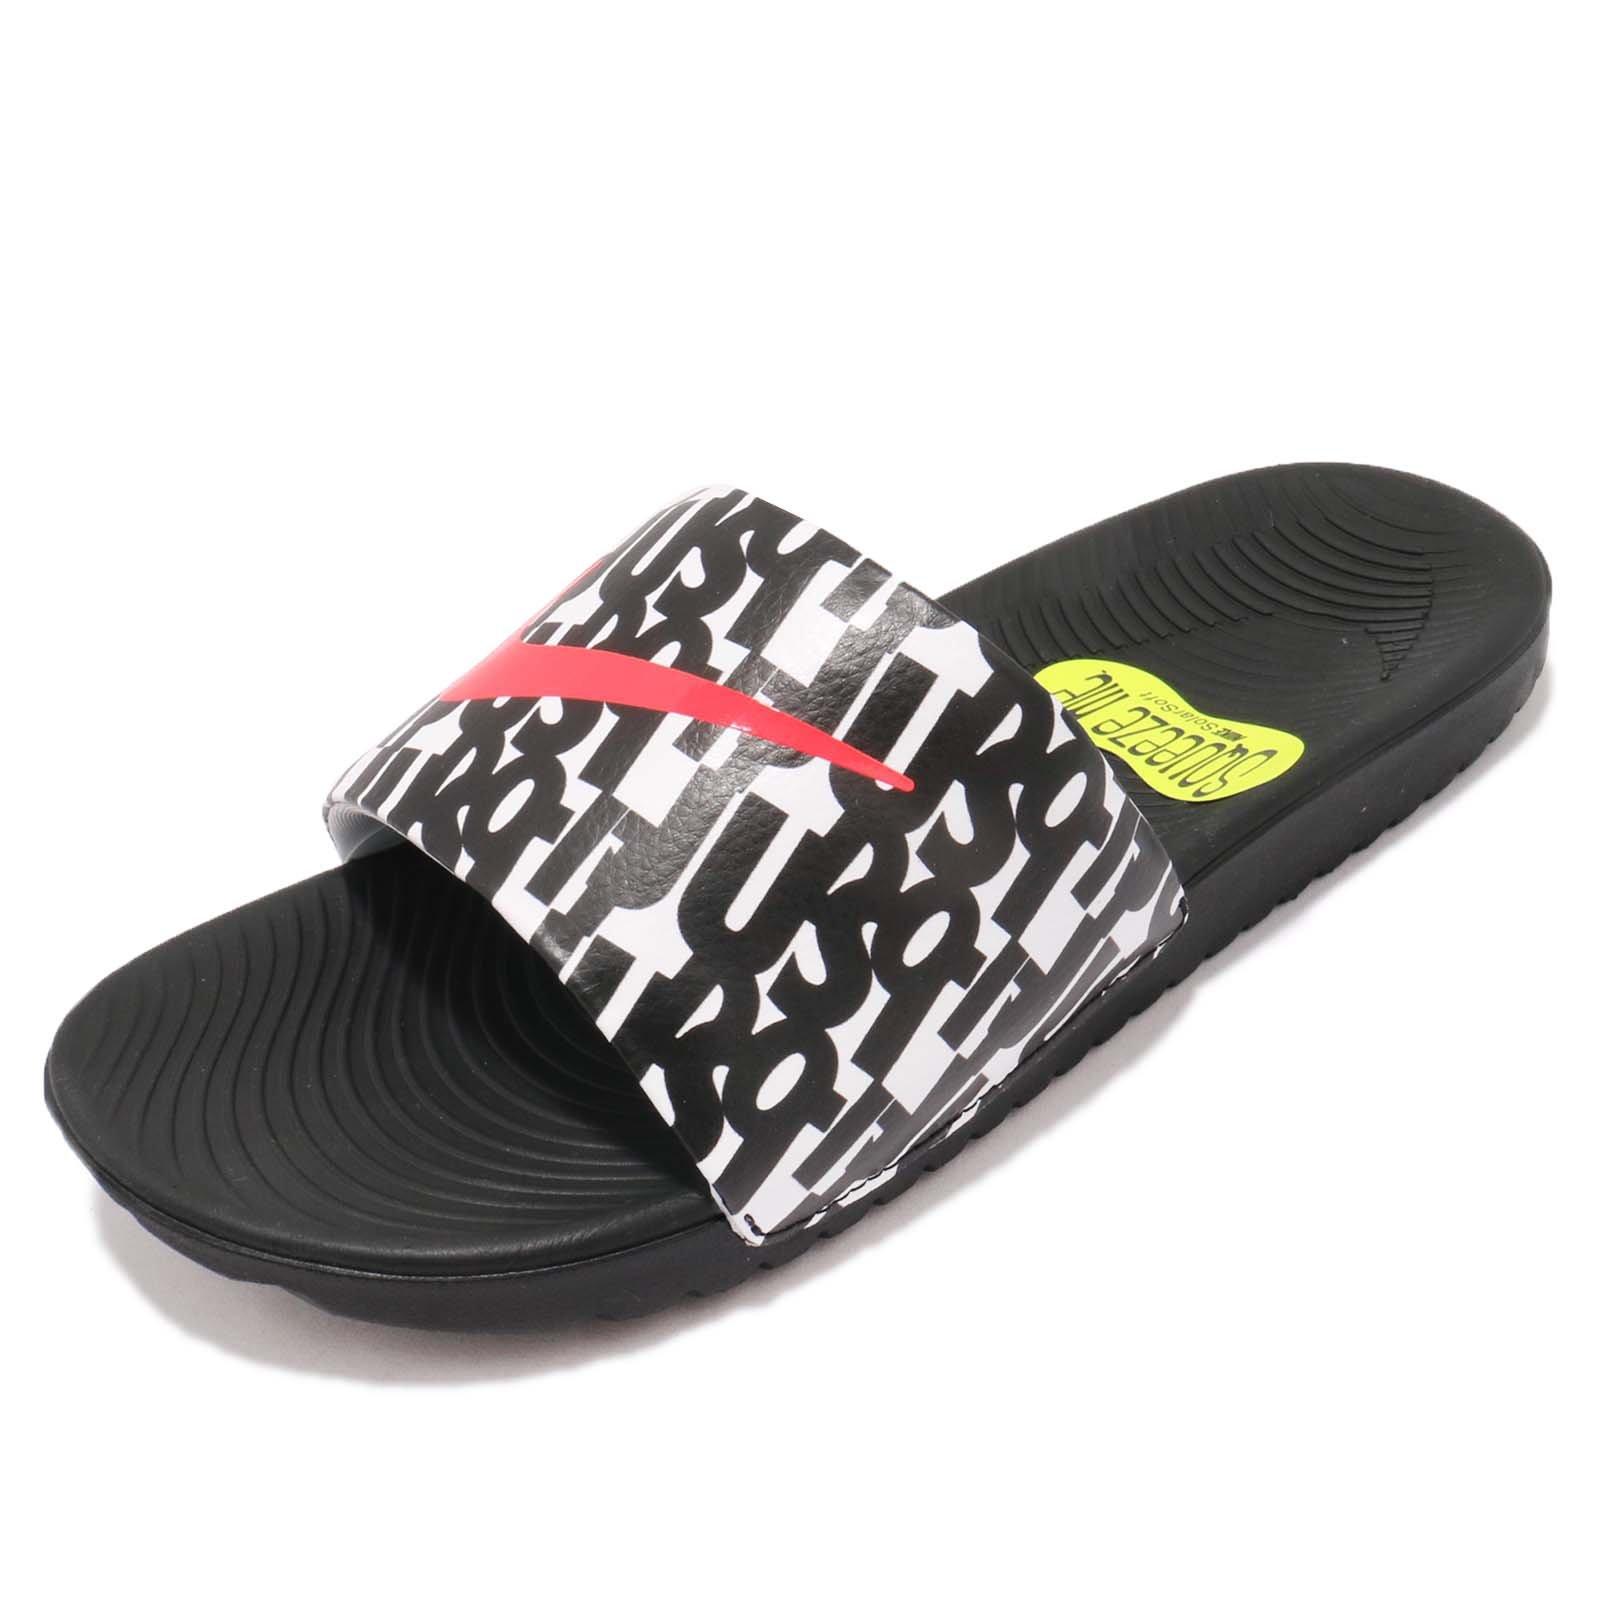 Nike Kid's Kawa Slide Print GS PS, Black/Bright Crimson-White, Youth Size 4